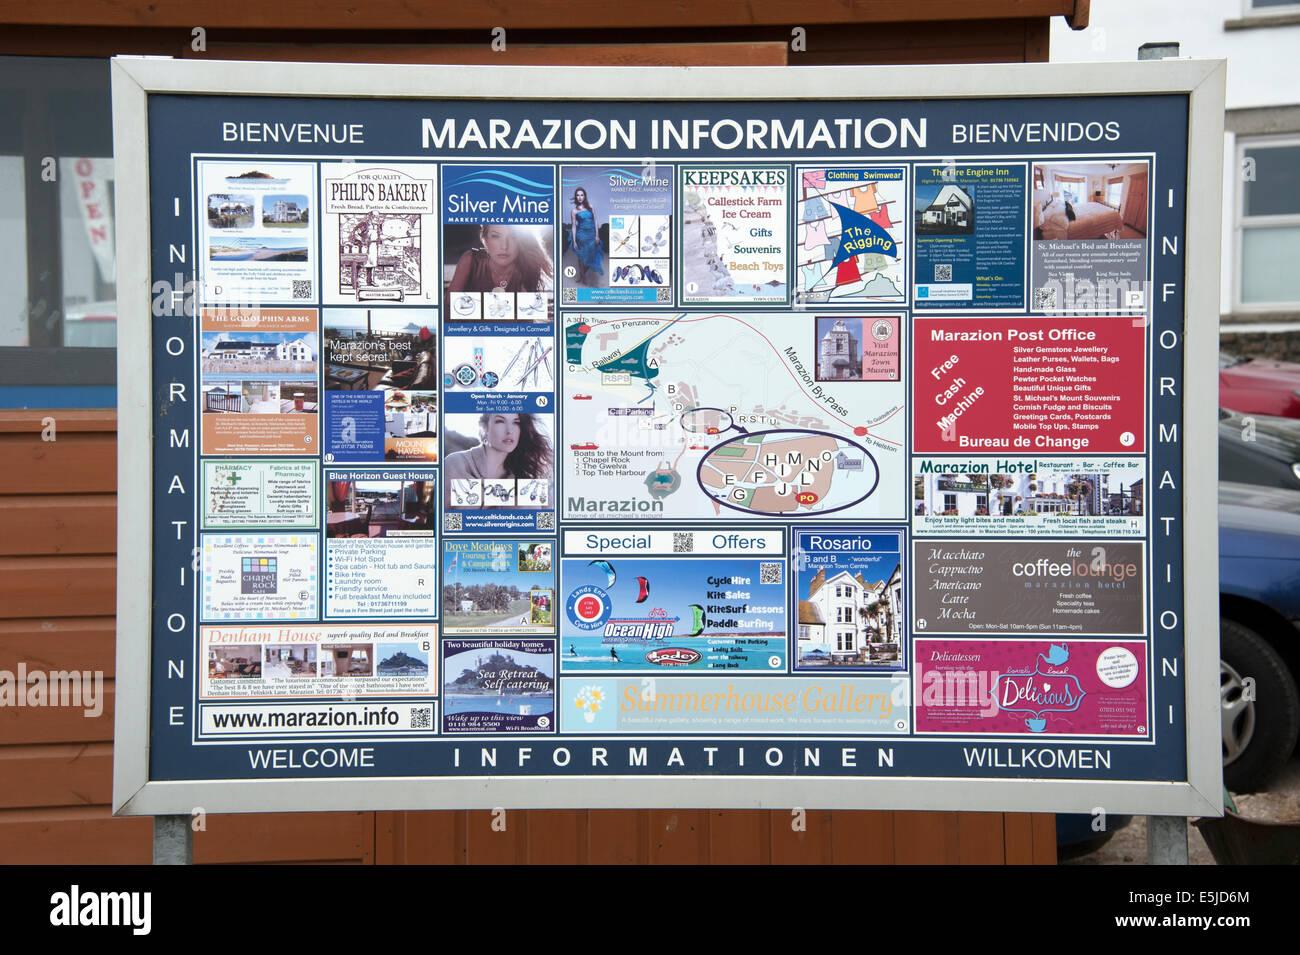 marazion tourist map uk united kingdom england great britain